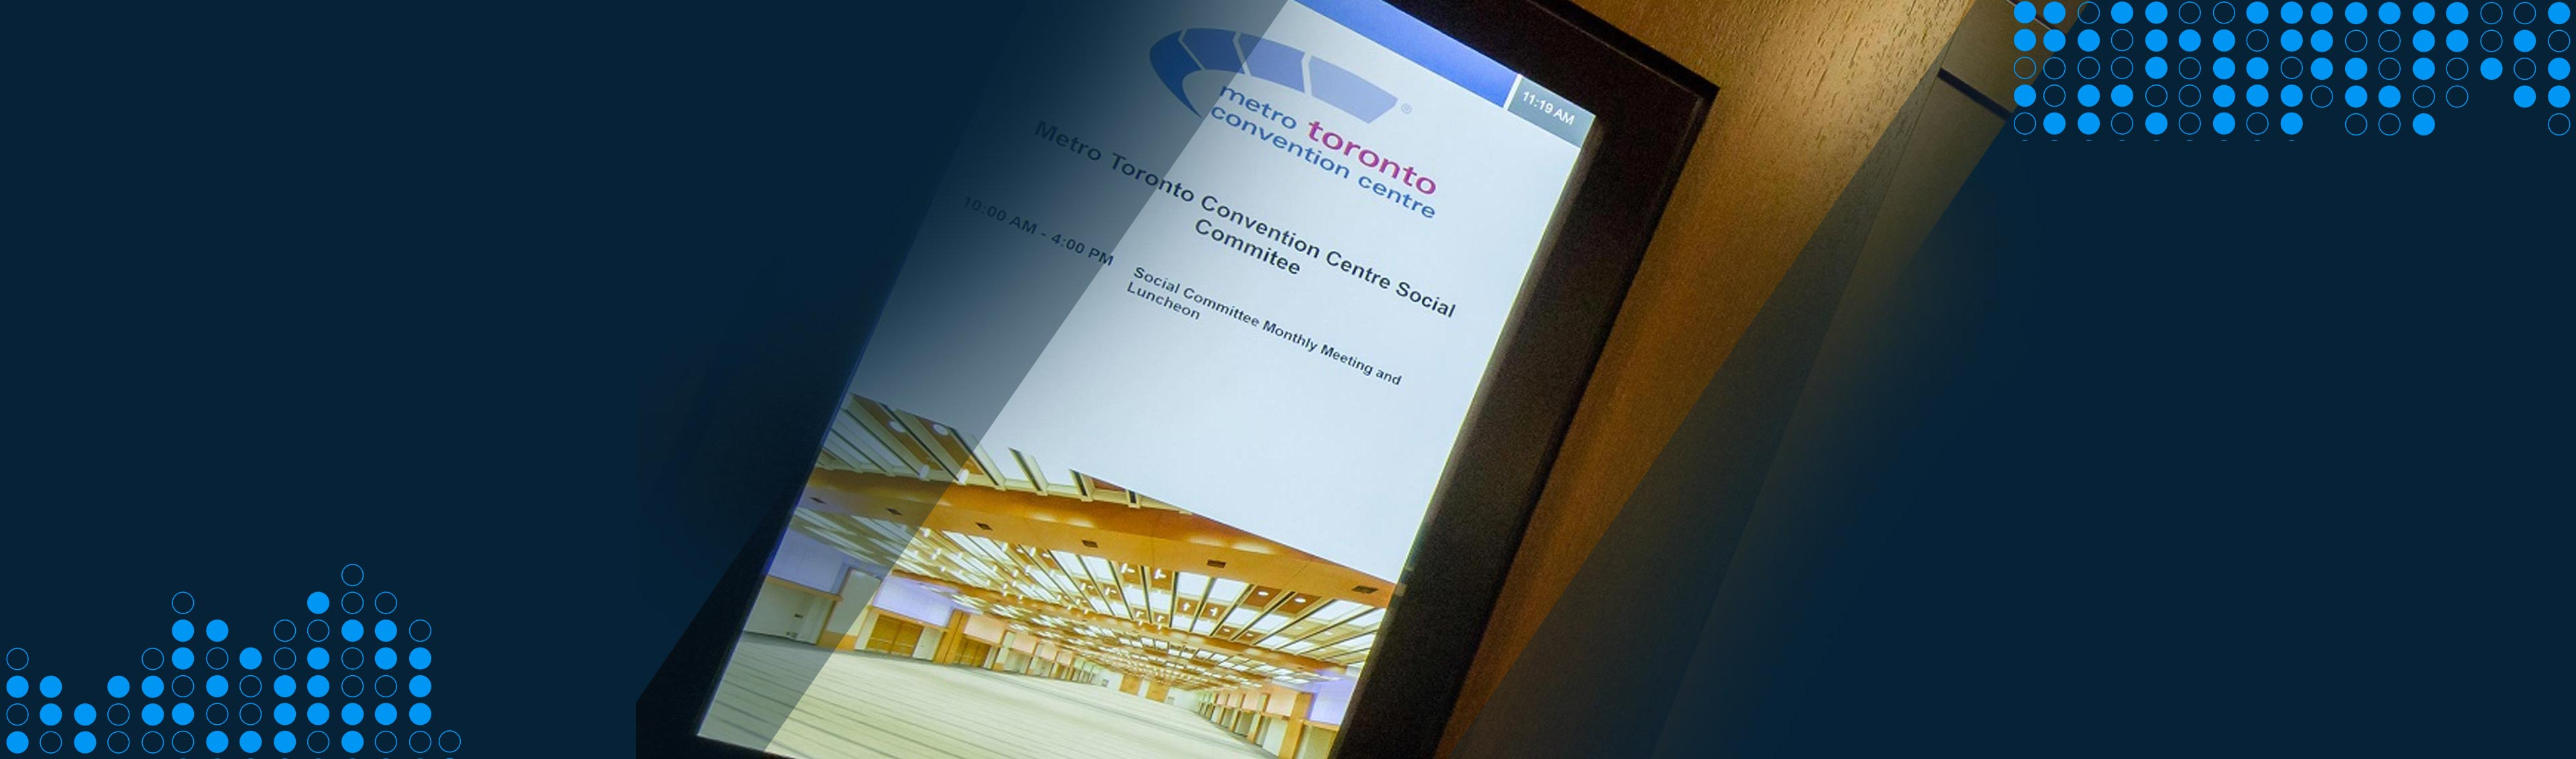 digital screen in hospitality venue